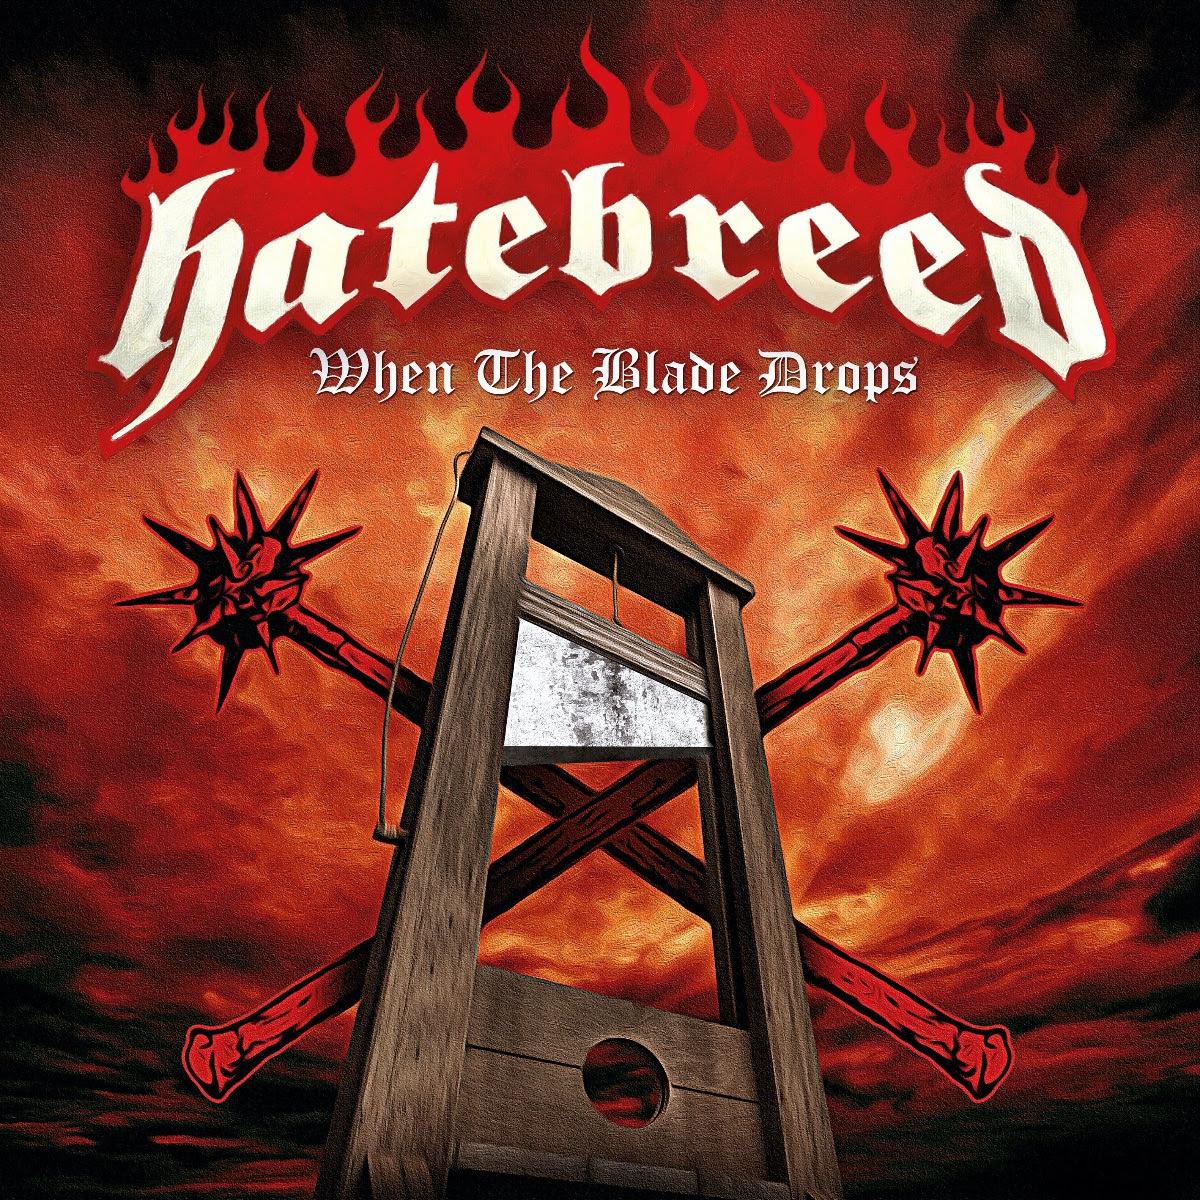 Hatebreed - When the Blade Drops single art